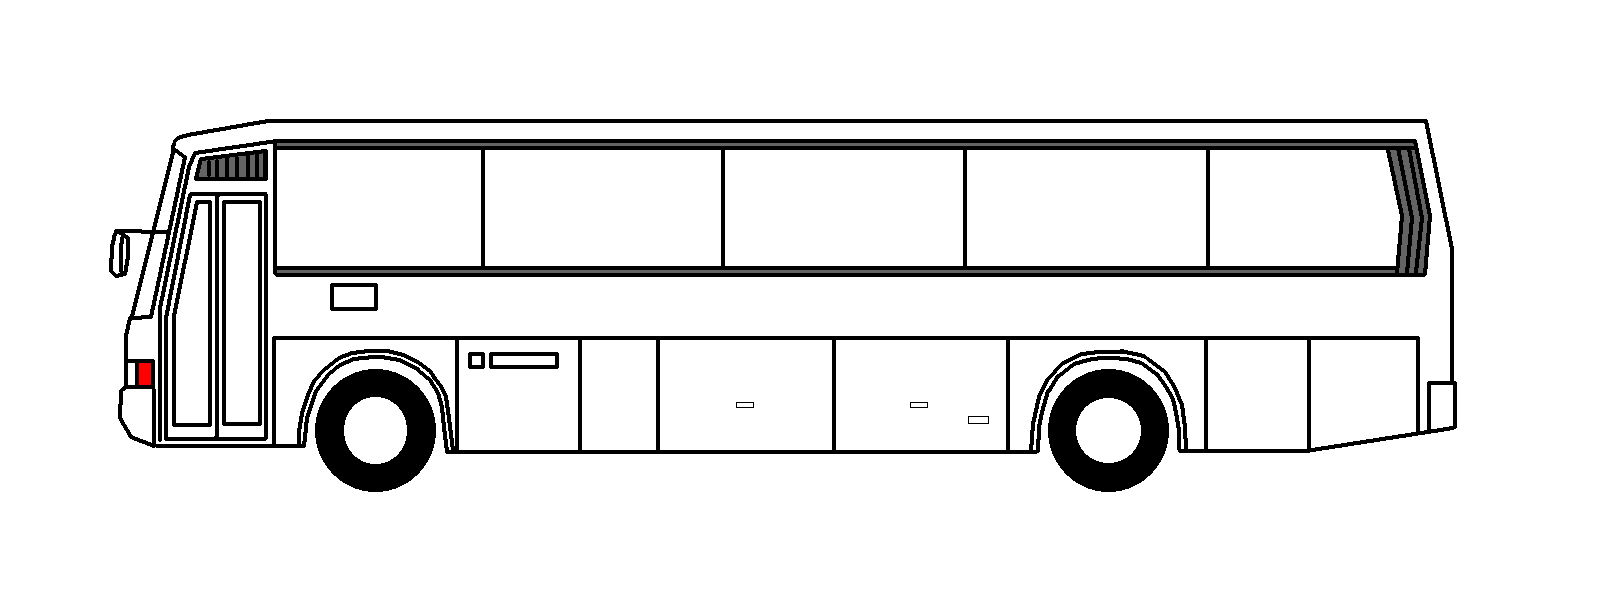 1600x601 School Bus Black White School Bus Side View Clipart Black